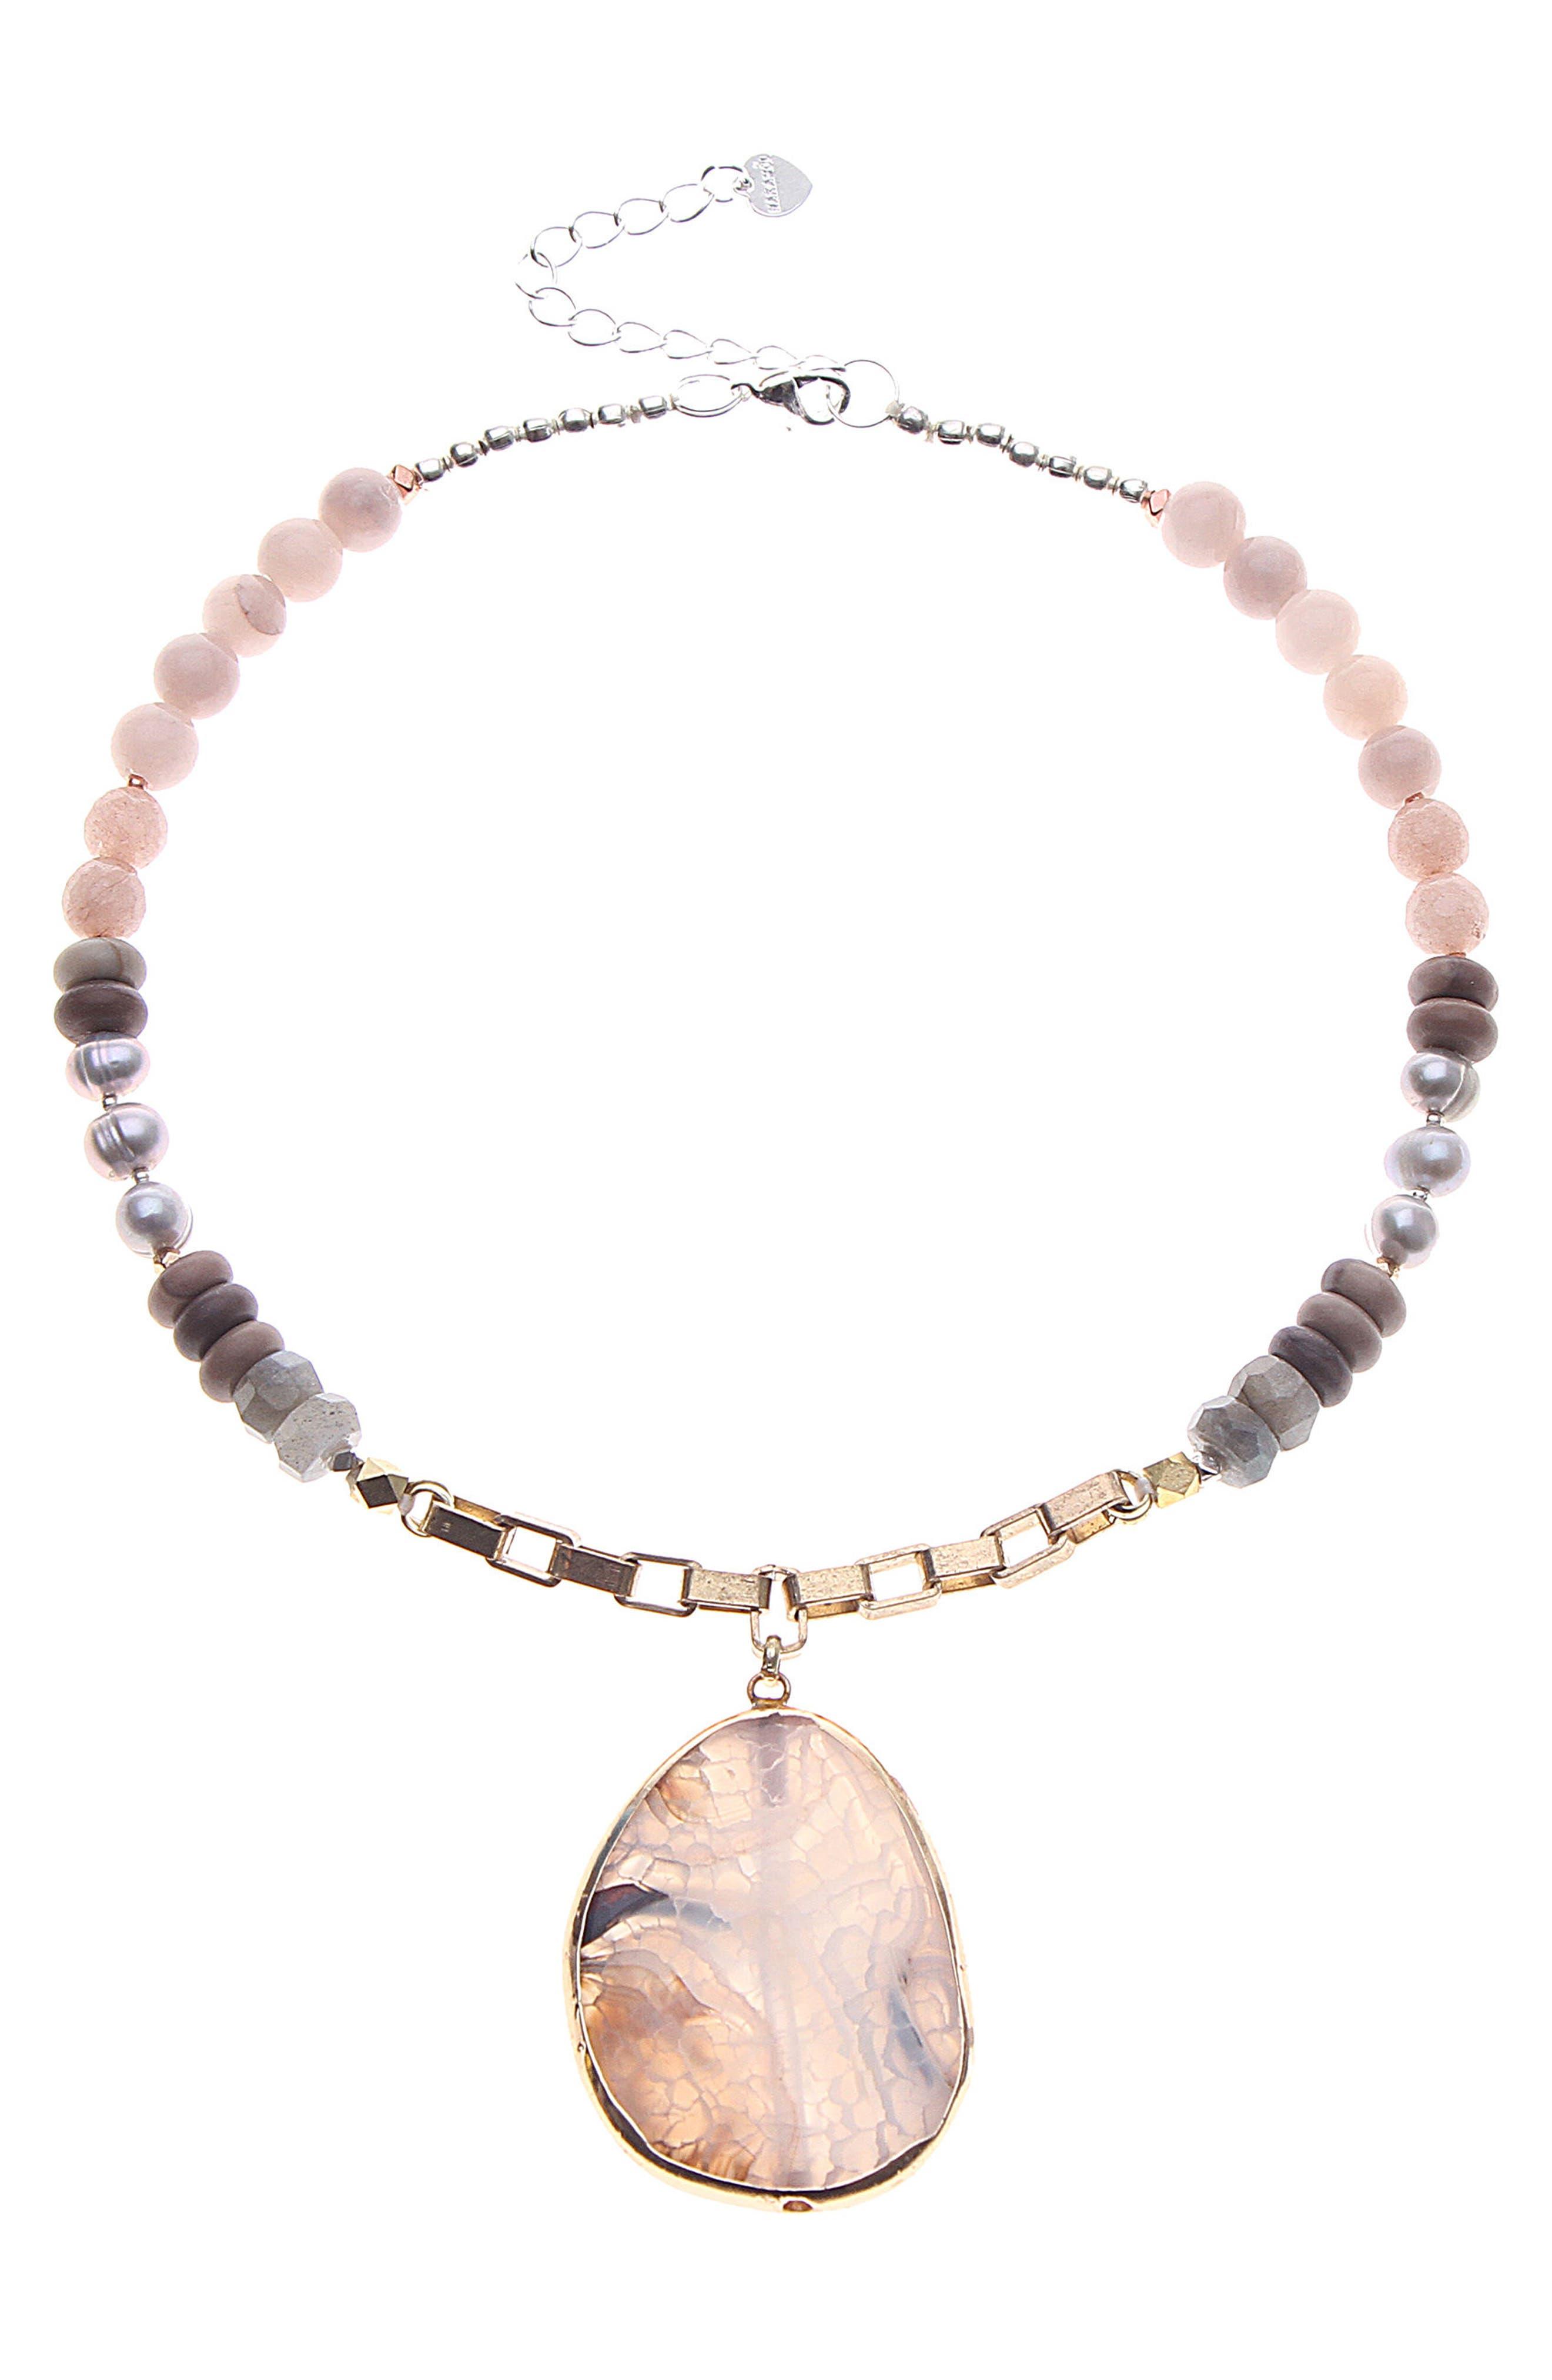 Semiprecious Stone & Pearl Pendant Necklace,                             Main thumbnail 1, color,                             Nude